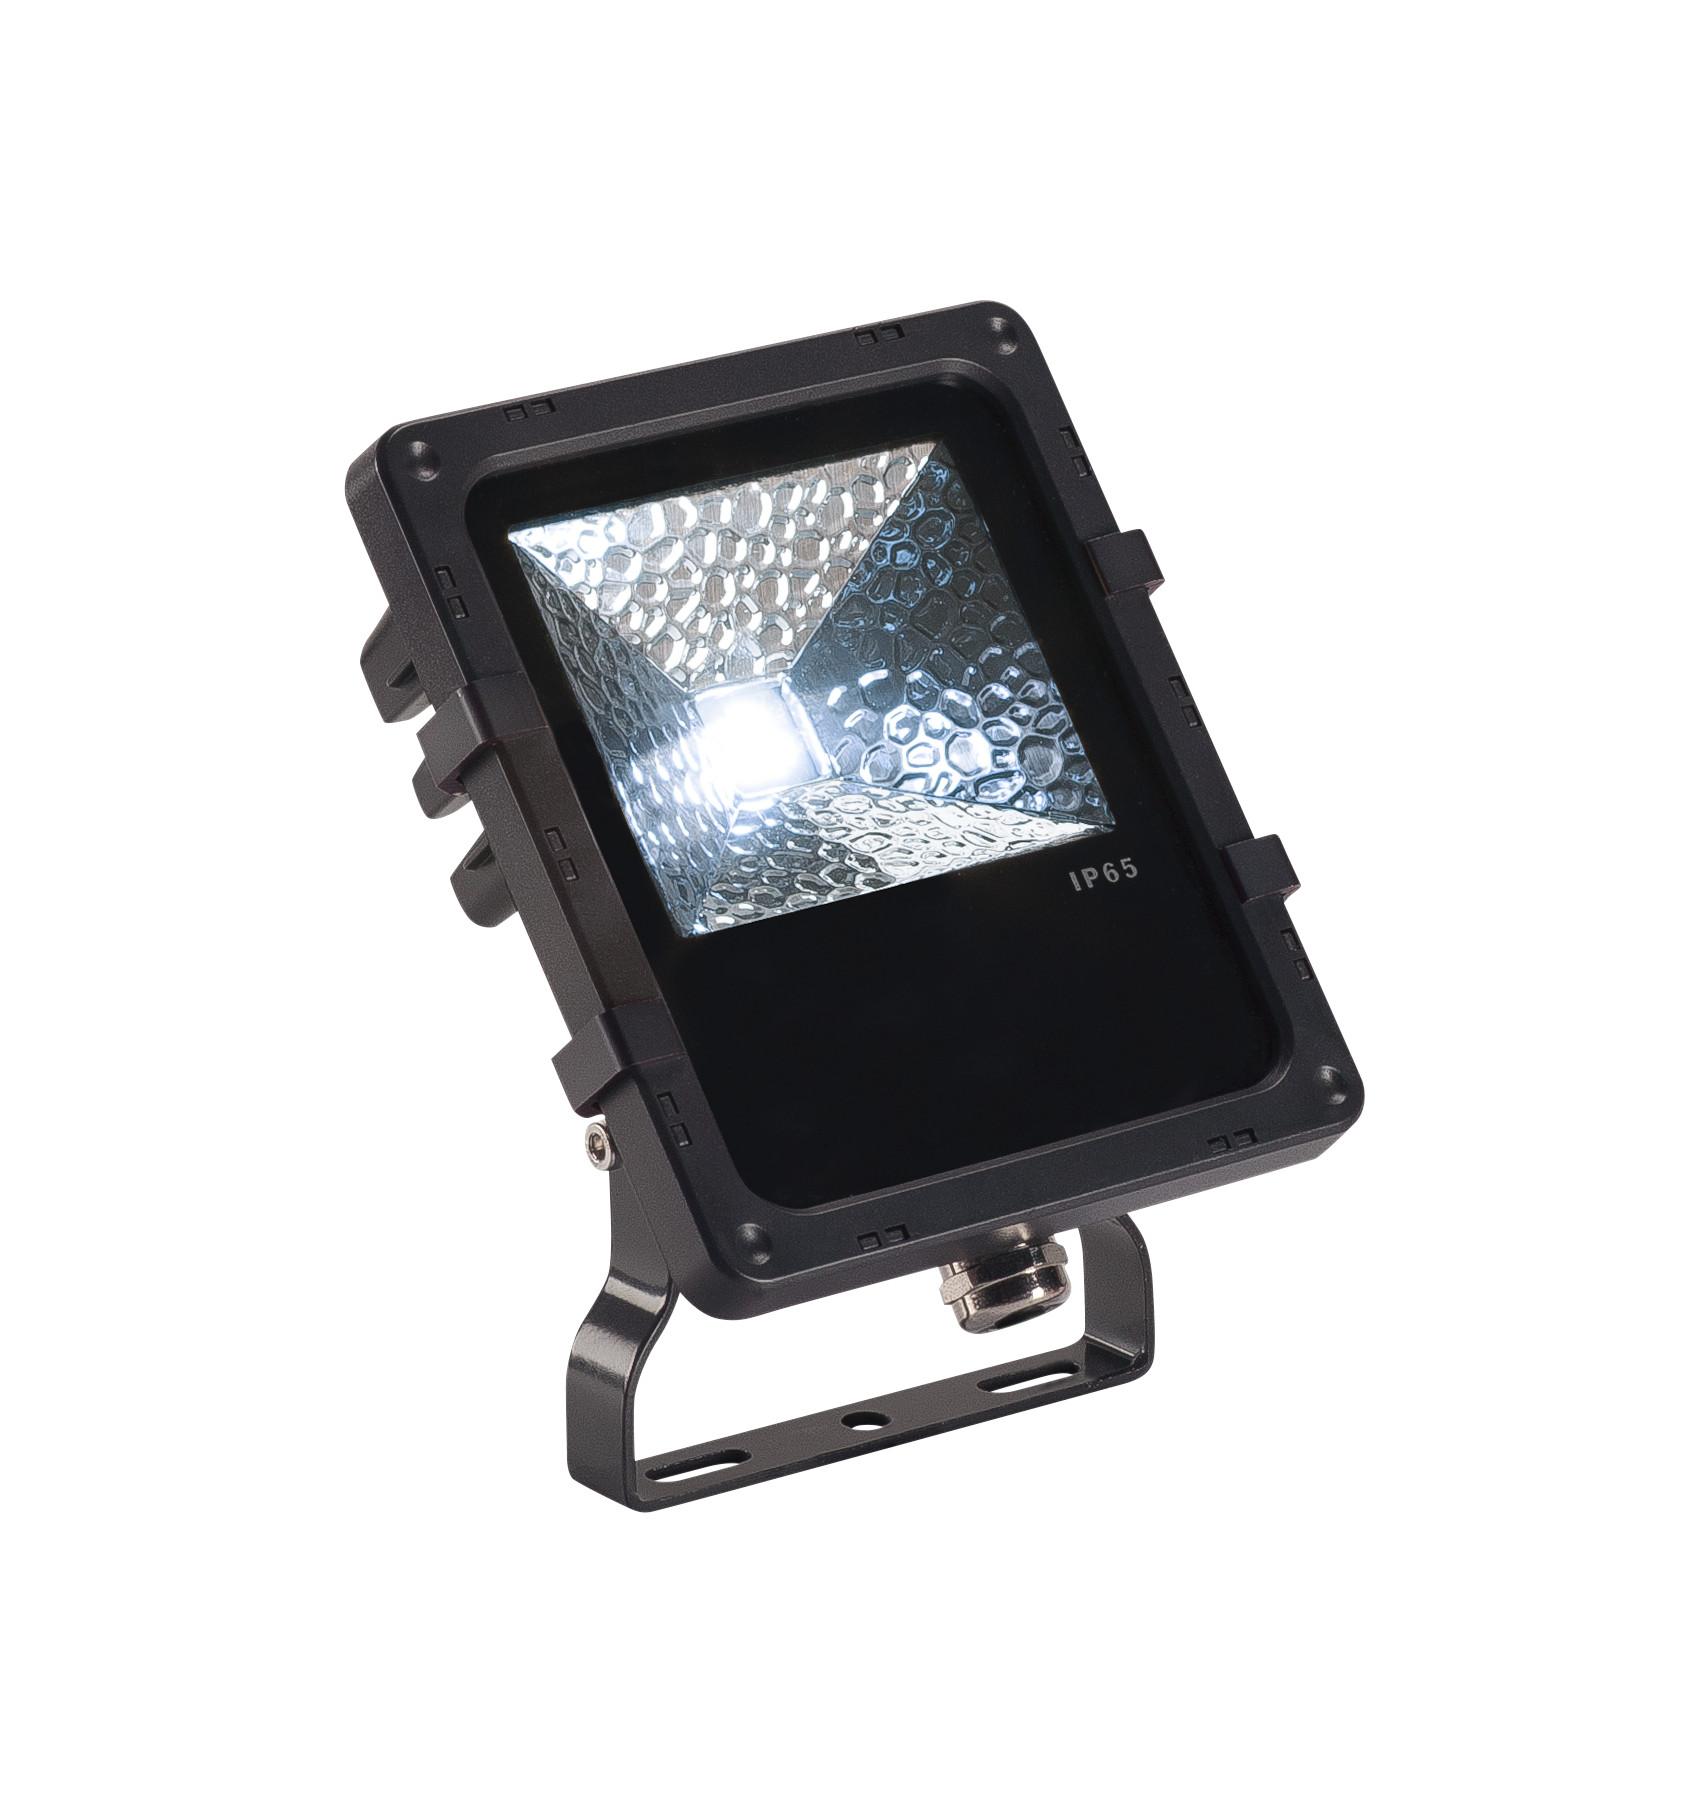 1 Stk DISOS, Outdoor Strahler, LED, 4000K, schwarz, 12W LI232350--